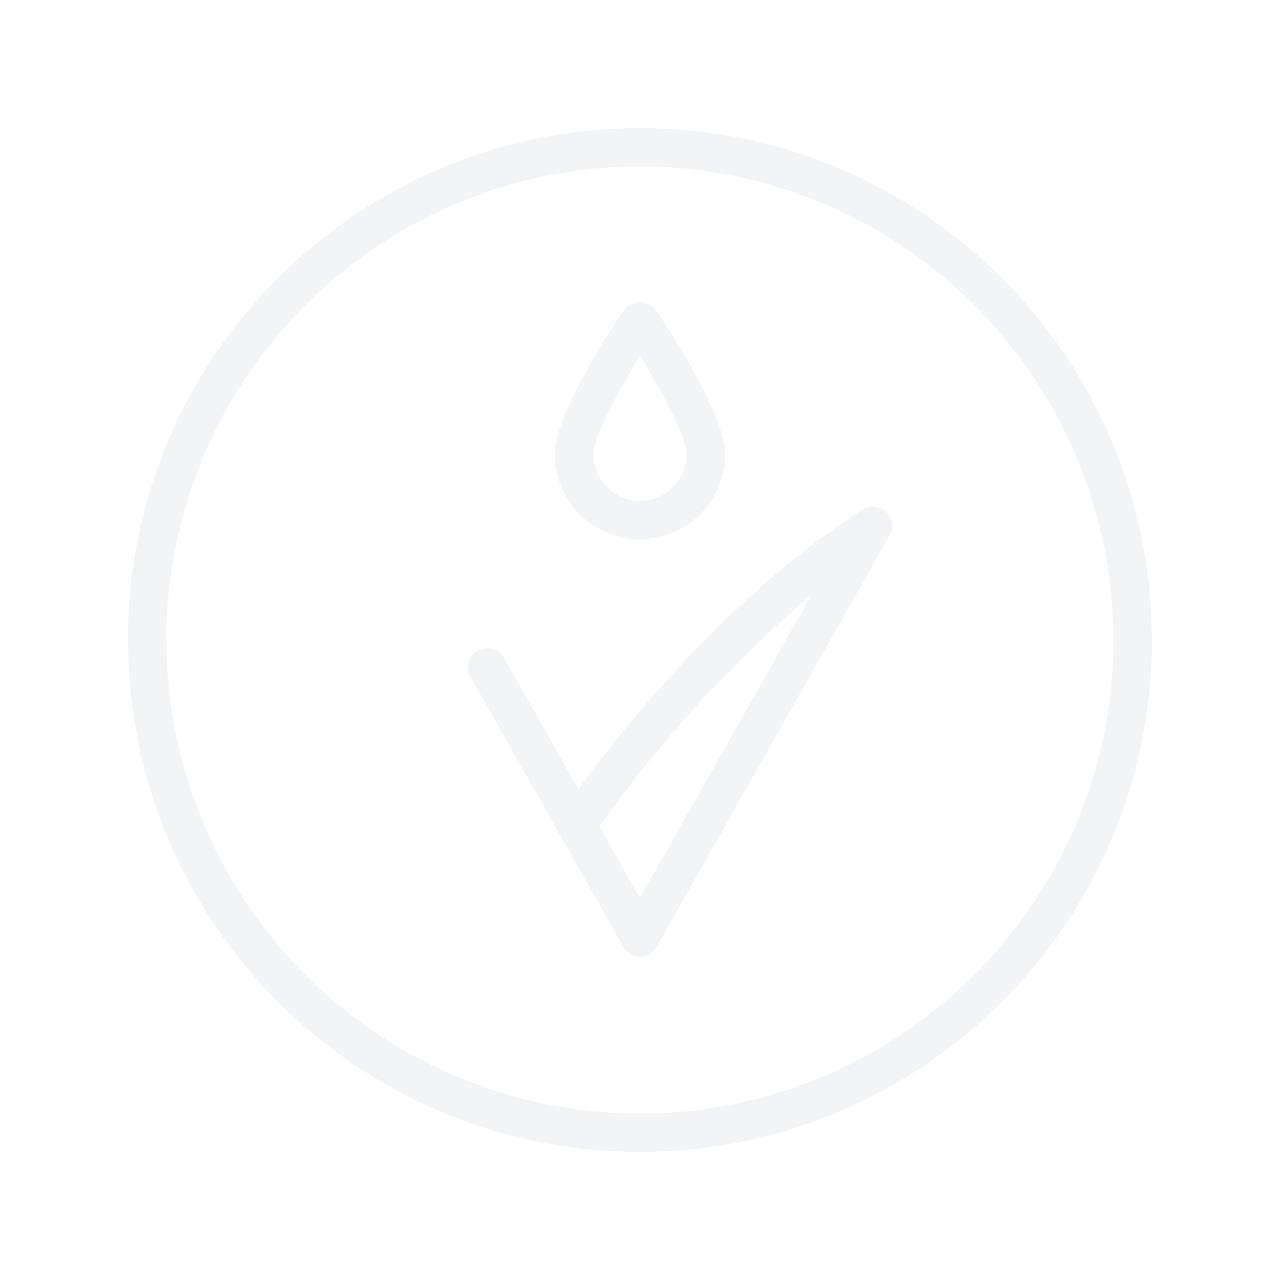 ELIZABETH ARDEN Nectarine Blossom Bath And Shower Gel 500ml